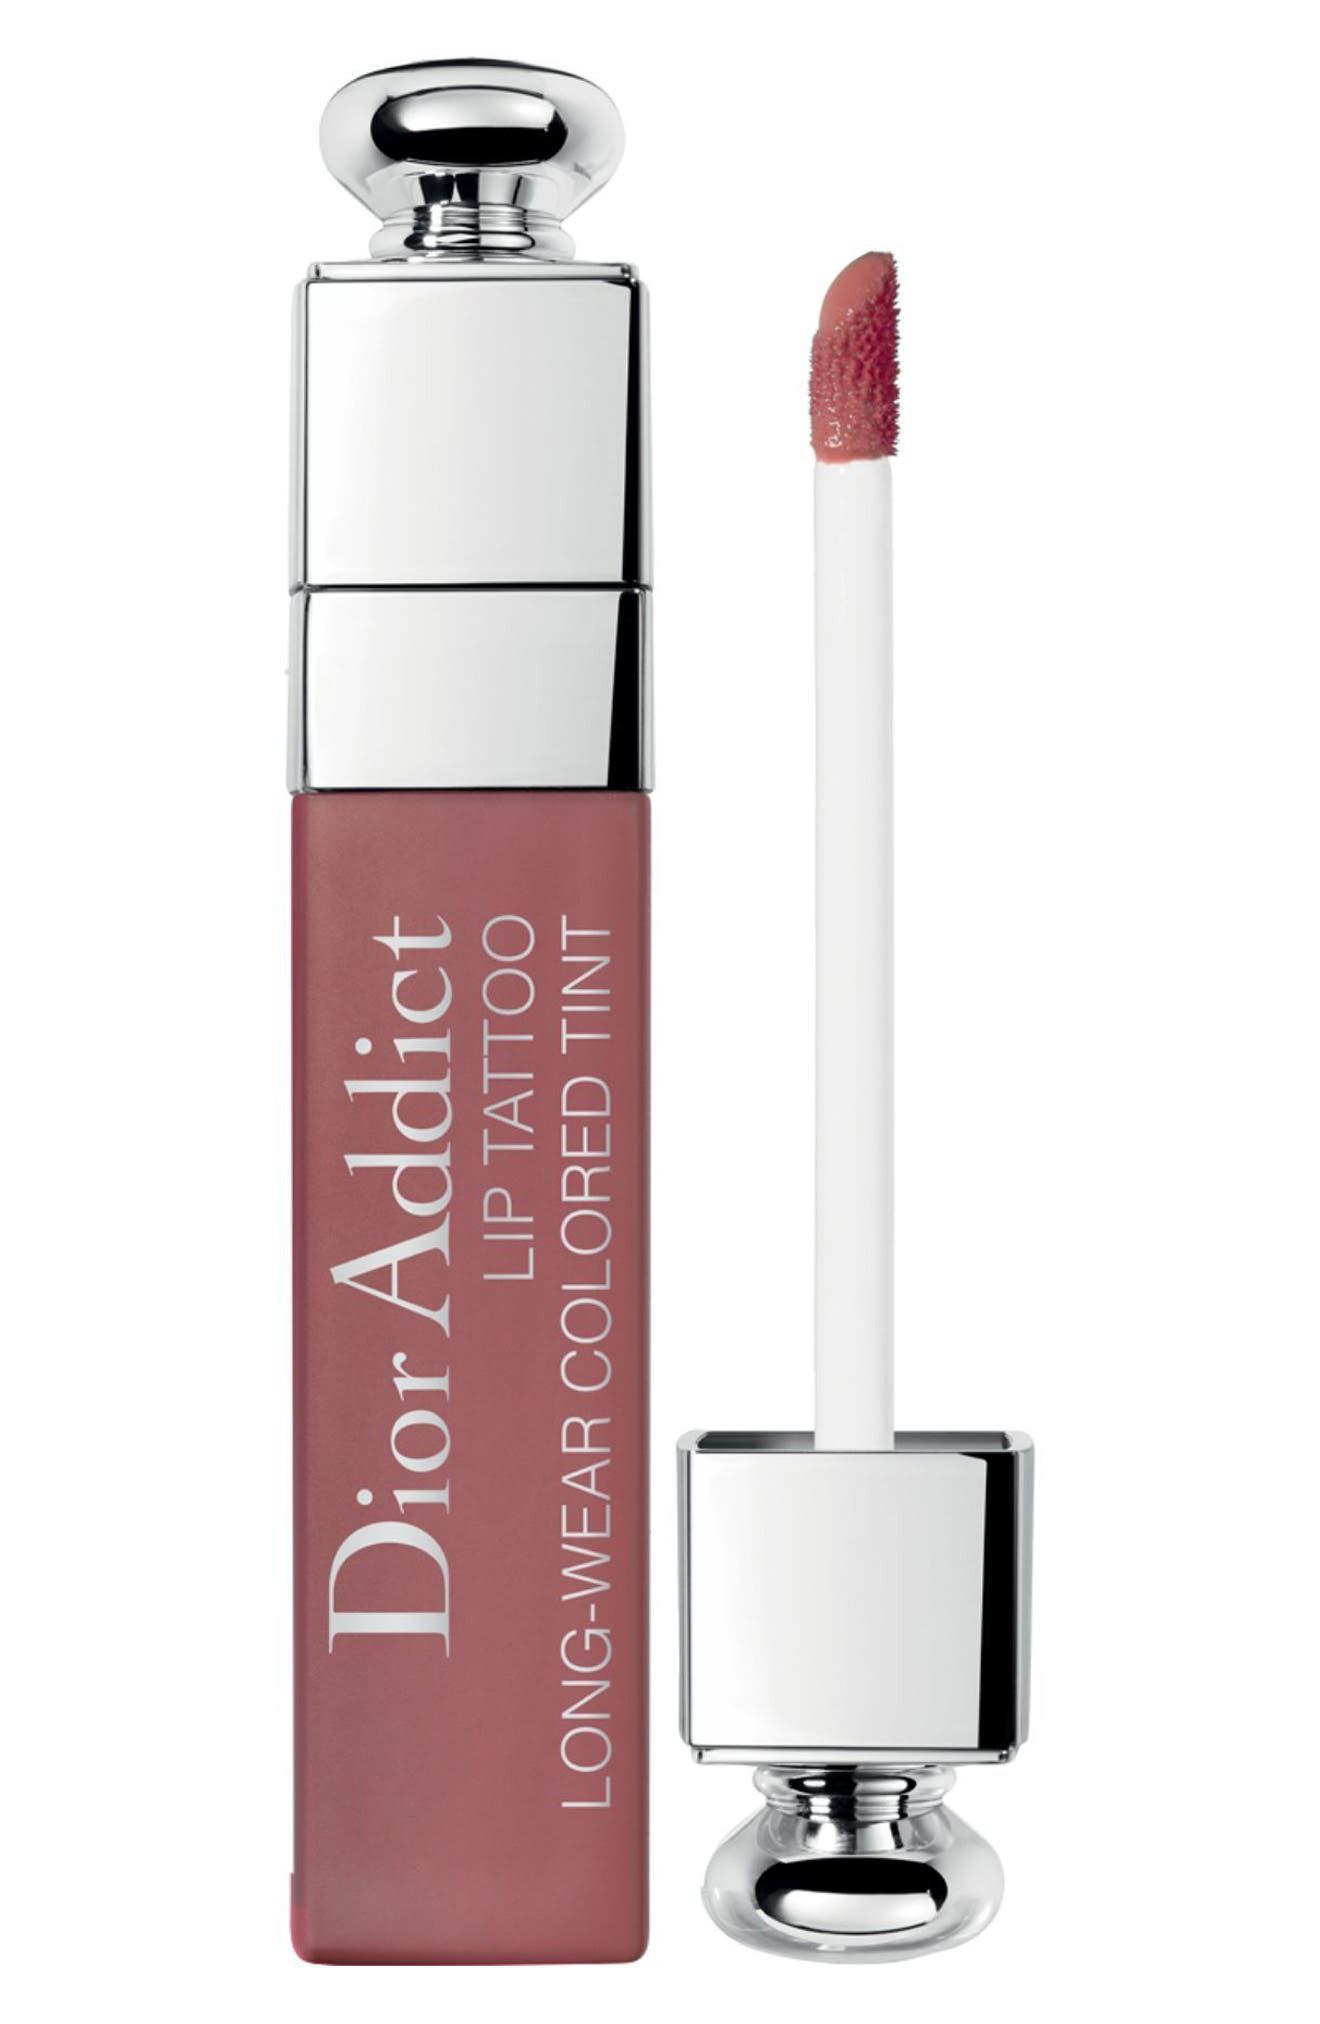 Dior Addict Lip Tattoo Long-Wearing Color Tint - 491 Natural Rosewood